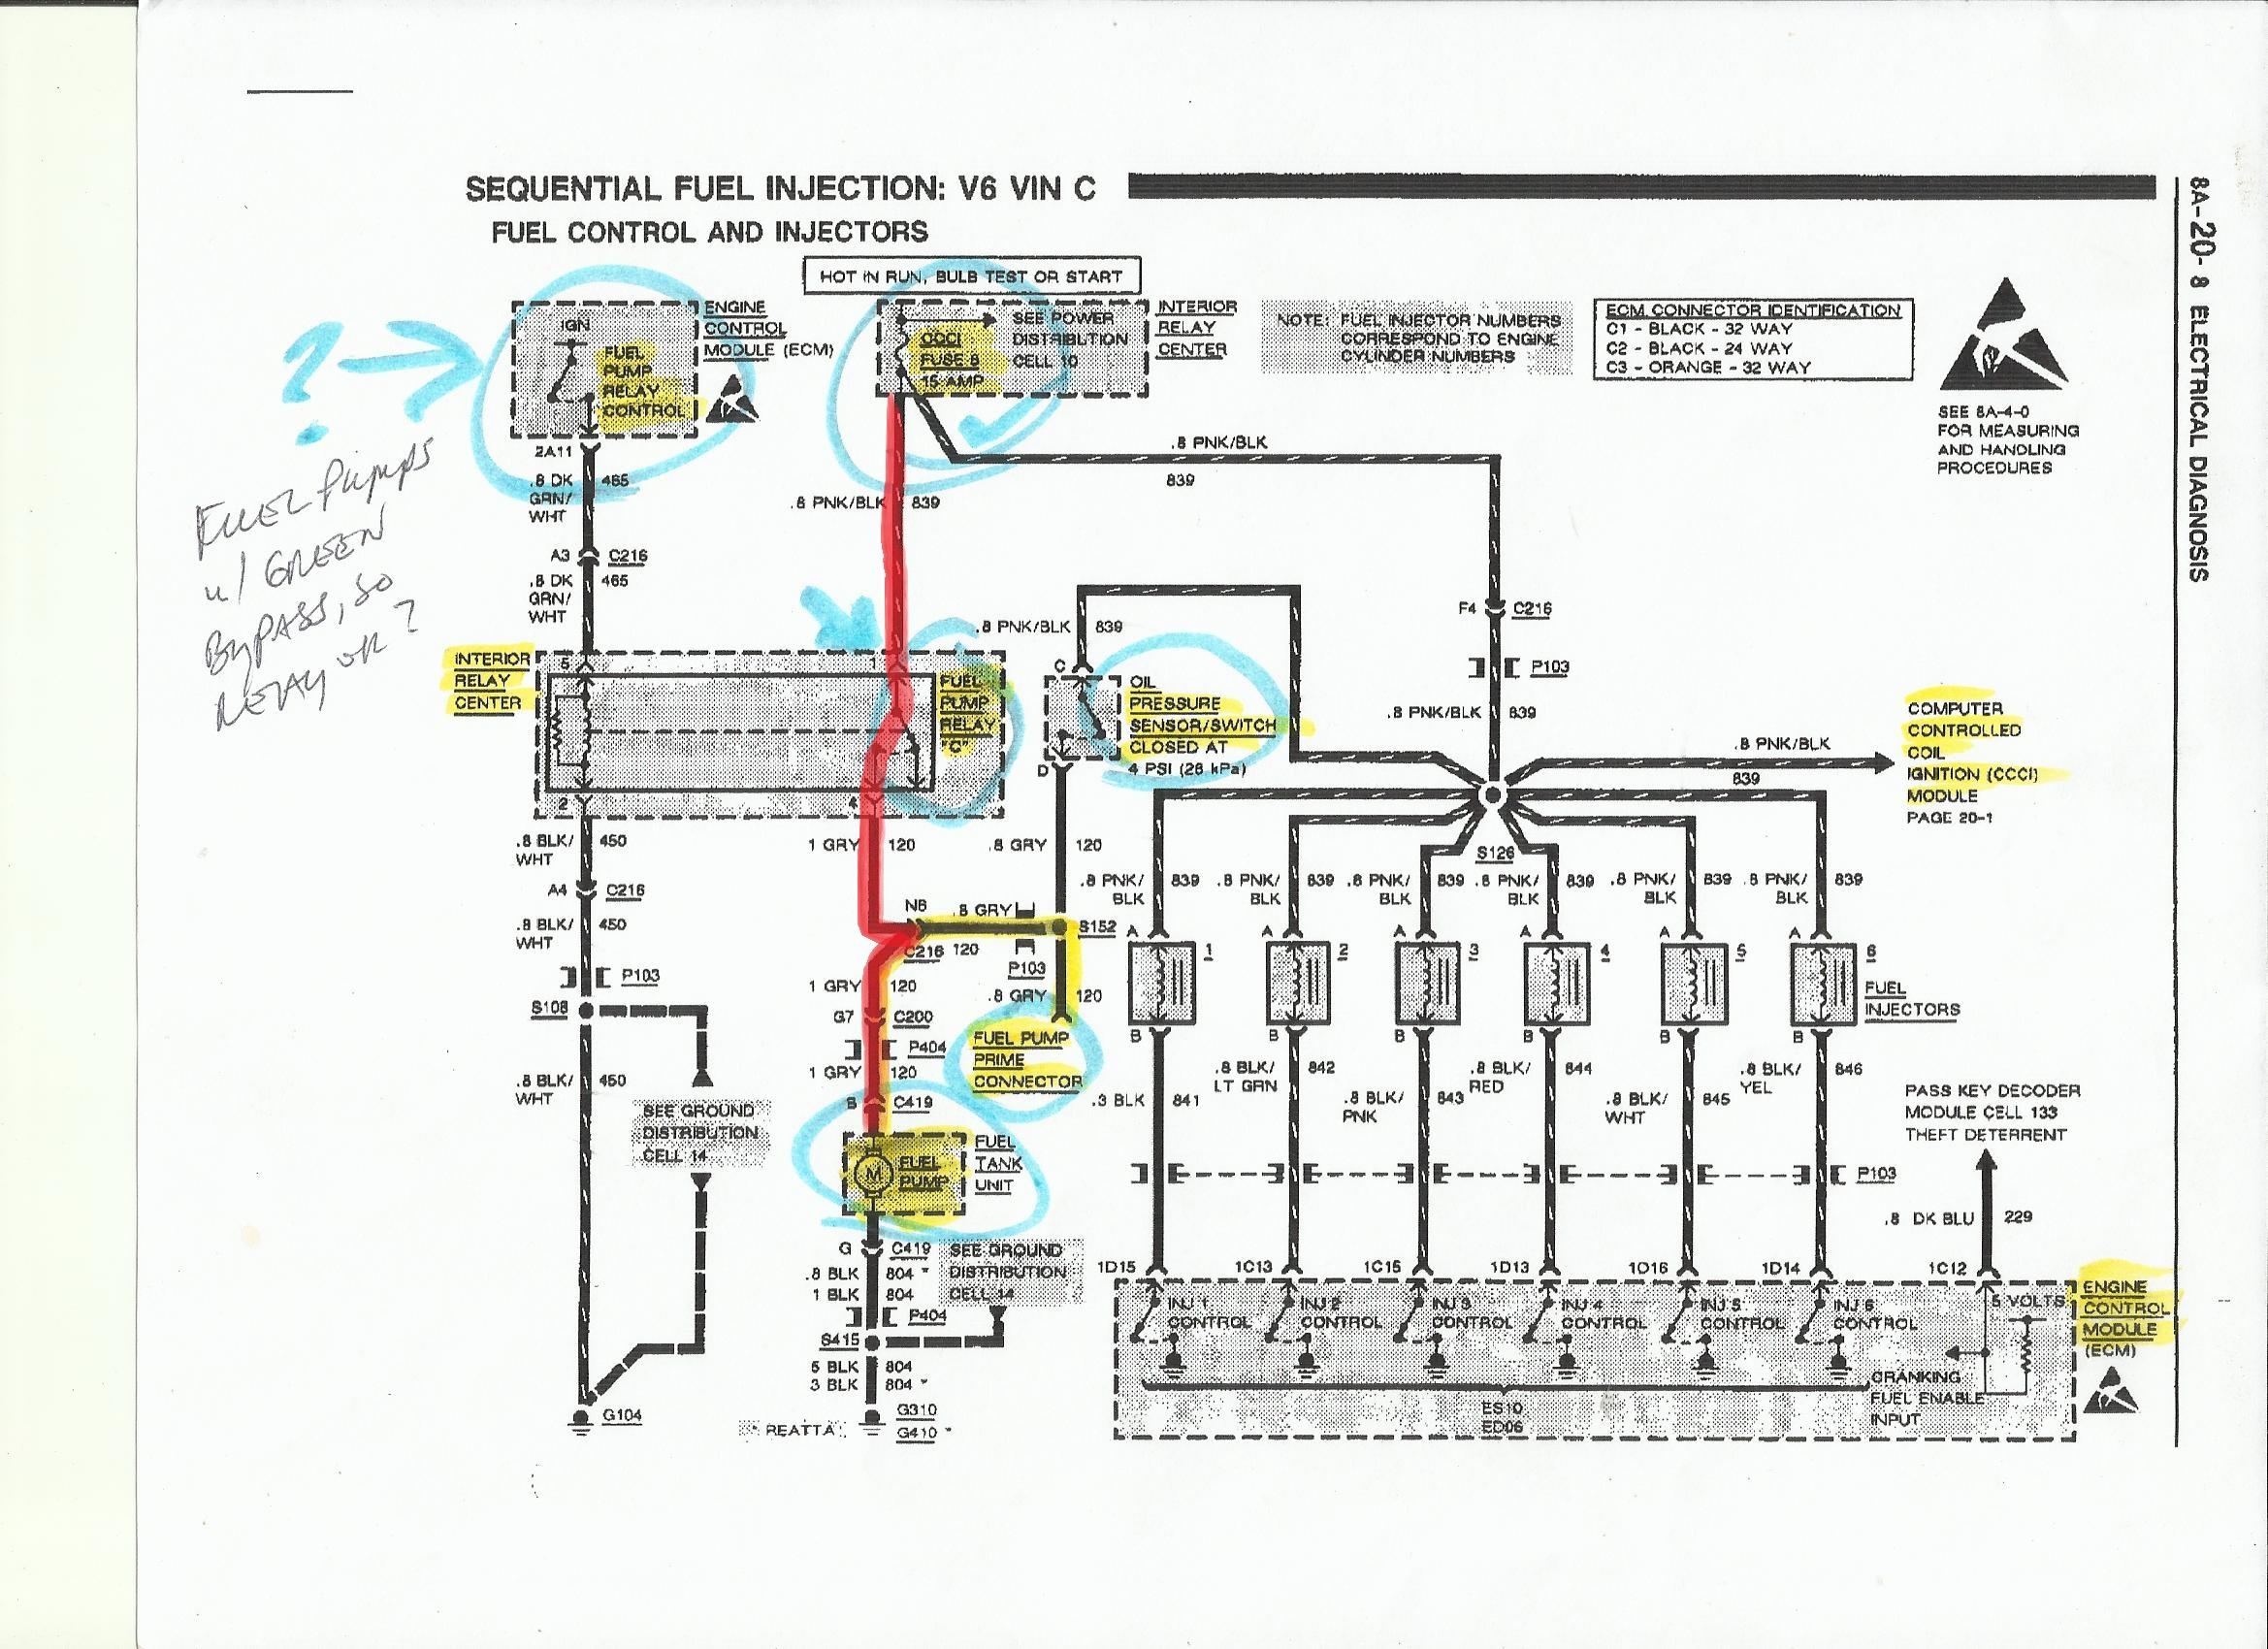 [DIAGRAM_5NL]  SL_4842] 1990 Buick Reatta Fuse Box Diagram Schematic Wiring | 1989 Buick Lesabre Engine Diagram |  | Terst Stica Cette Mohammedshrine Librar Wiring 101